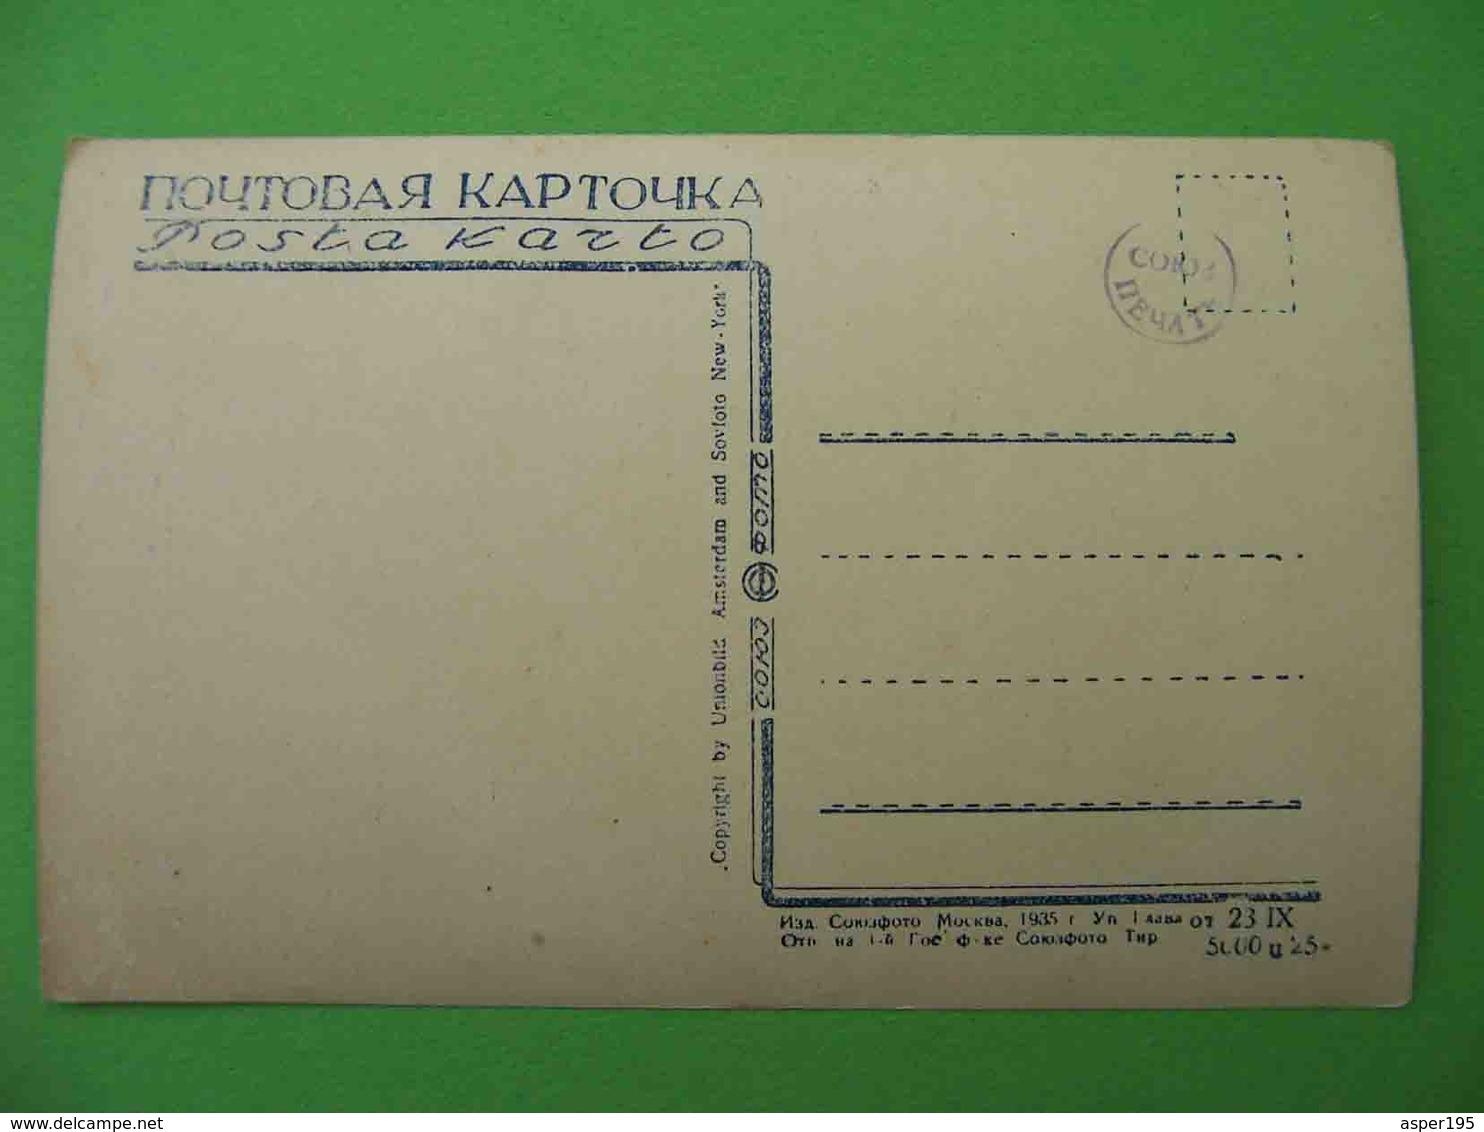 MOSCOW 1935 SADOVNIKI District, Street, Automobile. Russian Photo Postcard For Tourist - Russie